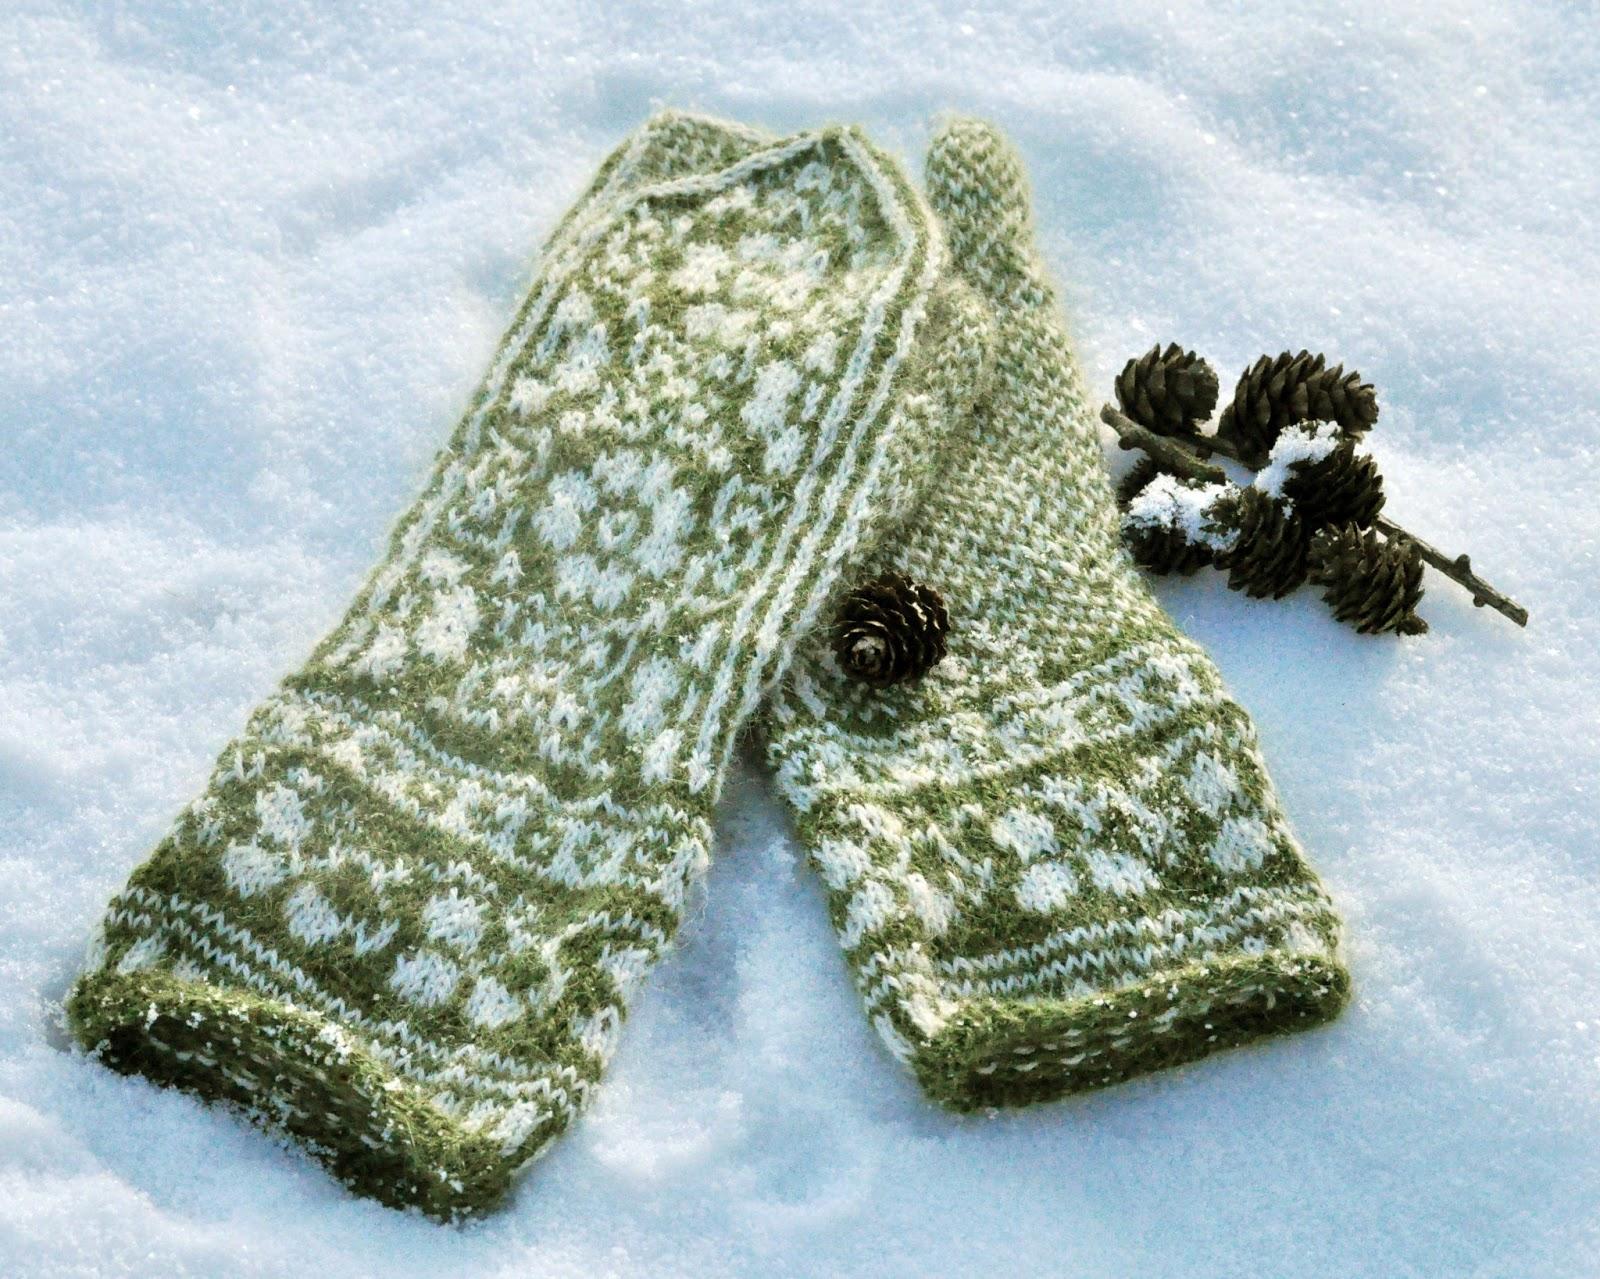 Kunden zuerst lässige Schuhe Top Qualität pi.pa.po.: Norwegian Mittens :: Norweger-Handschuhe